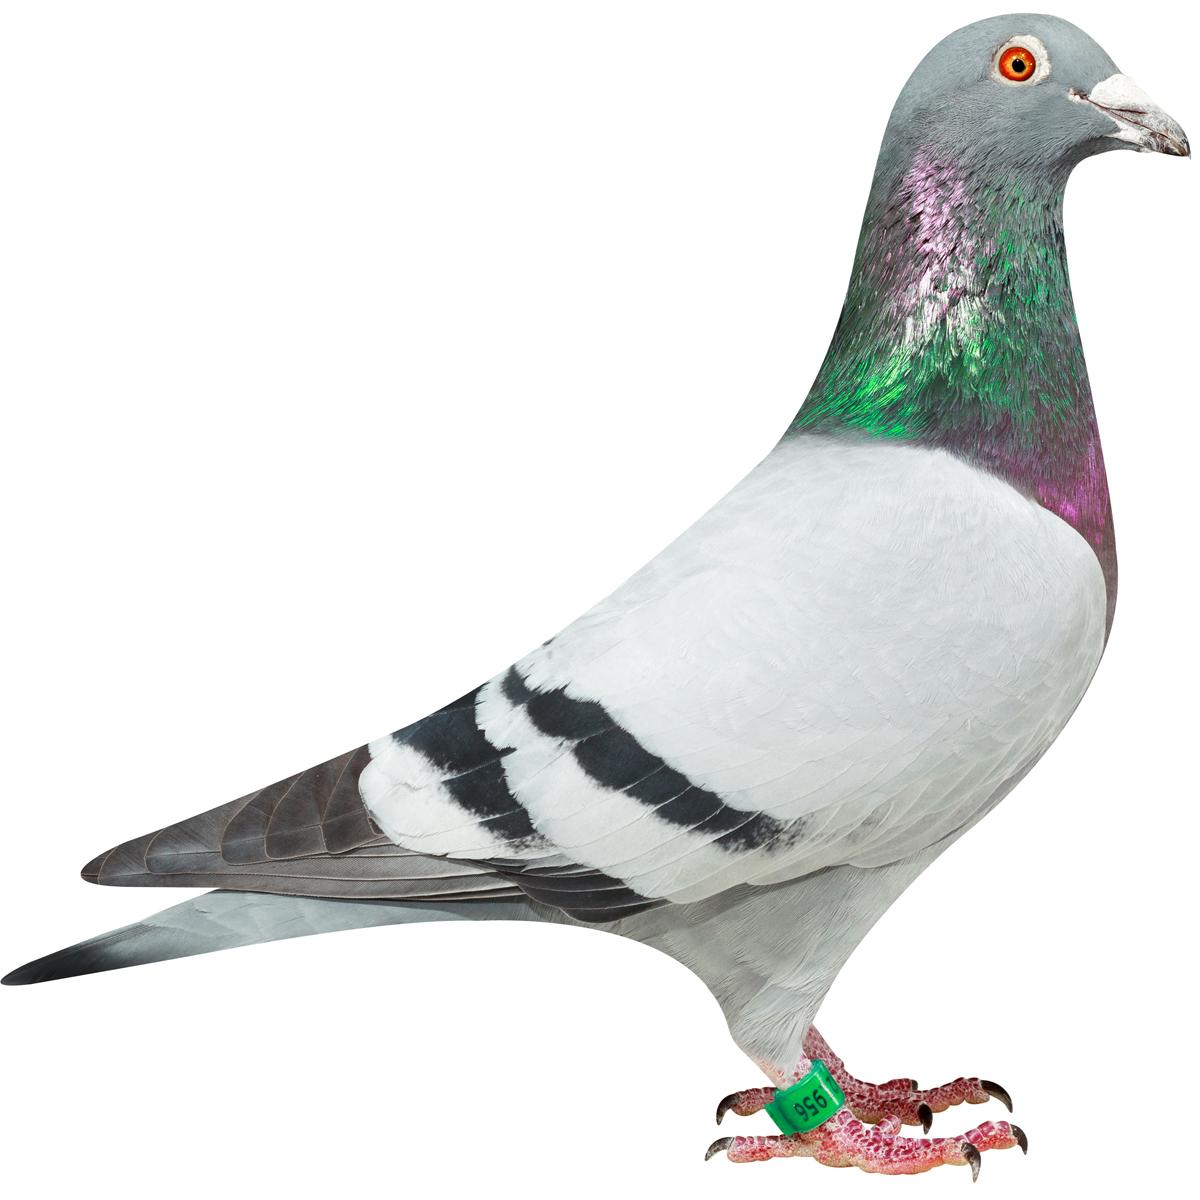 NL13-1921956